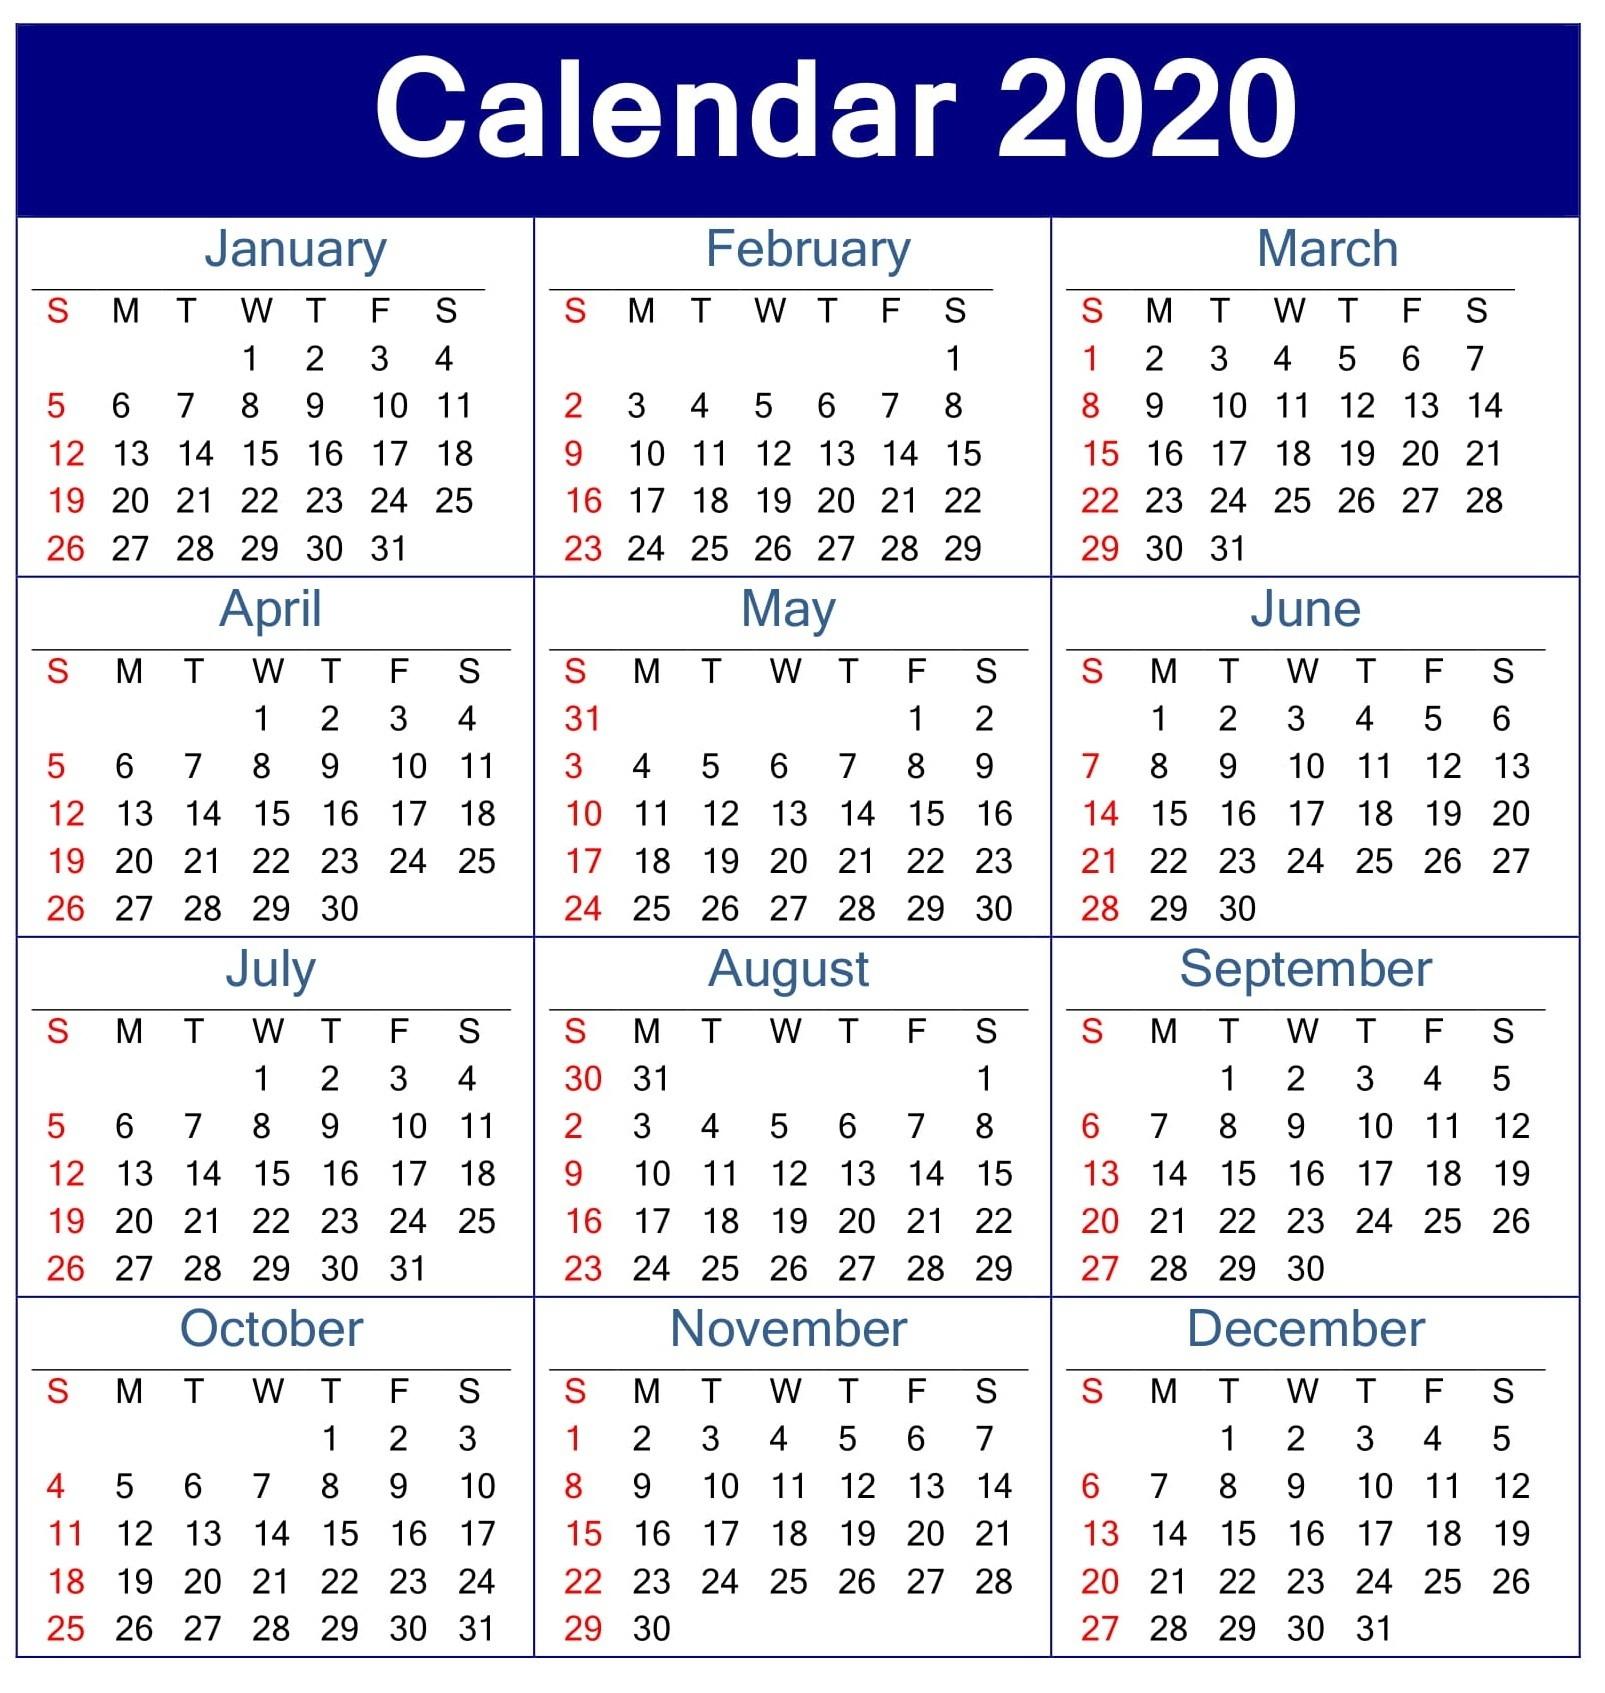 Printable Calendar 2020 Pdf Template – Free Latest Calendar-2020 Employee Attendance Template